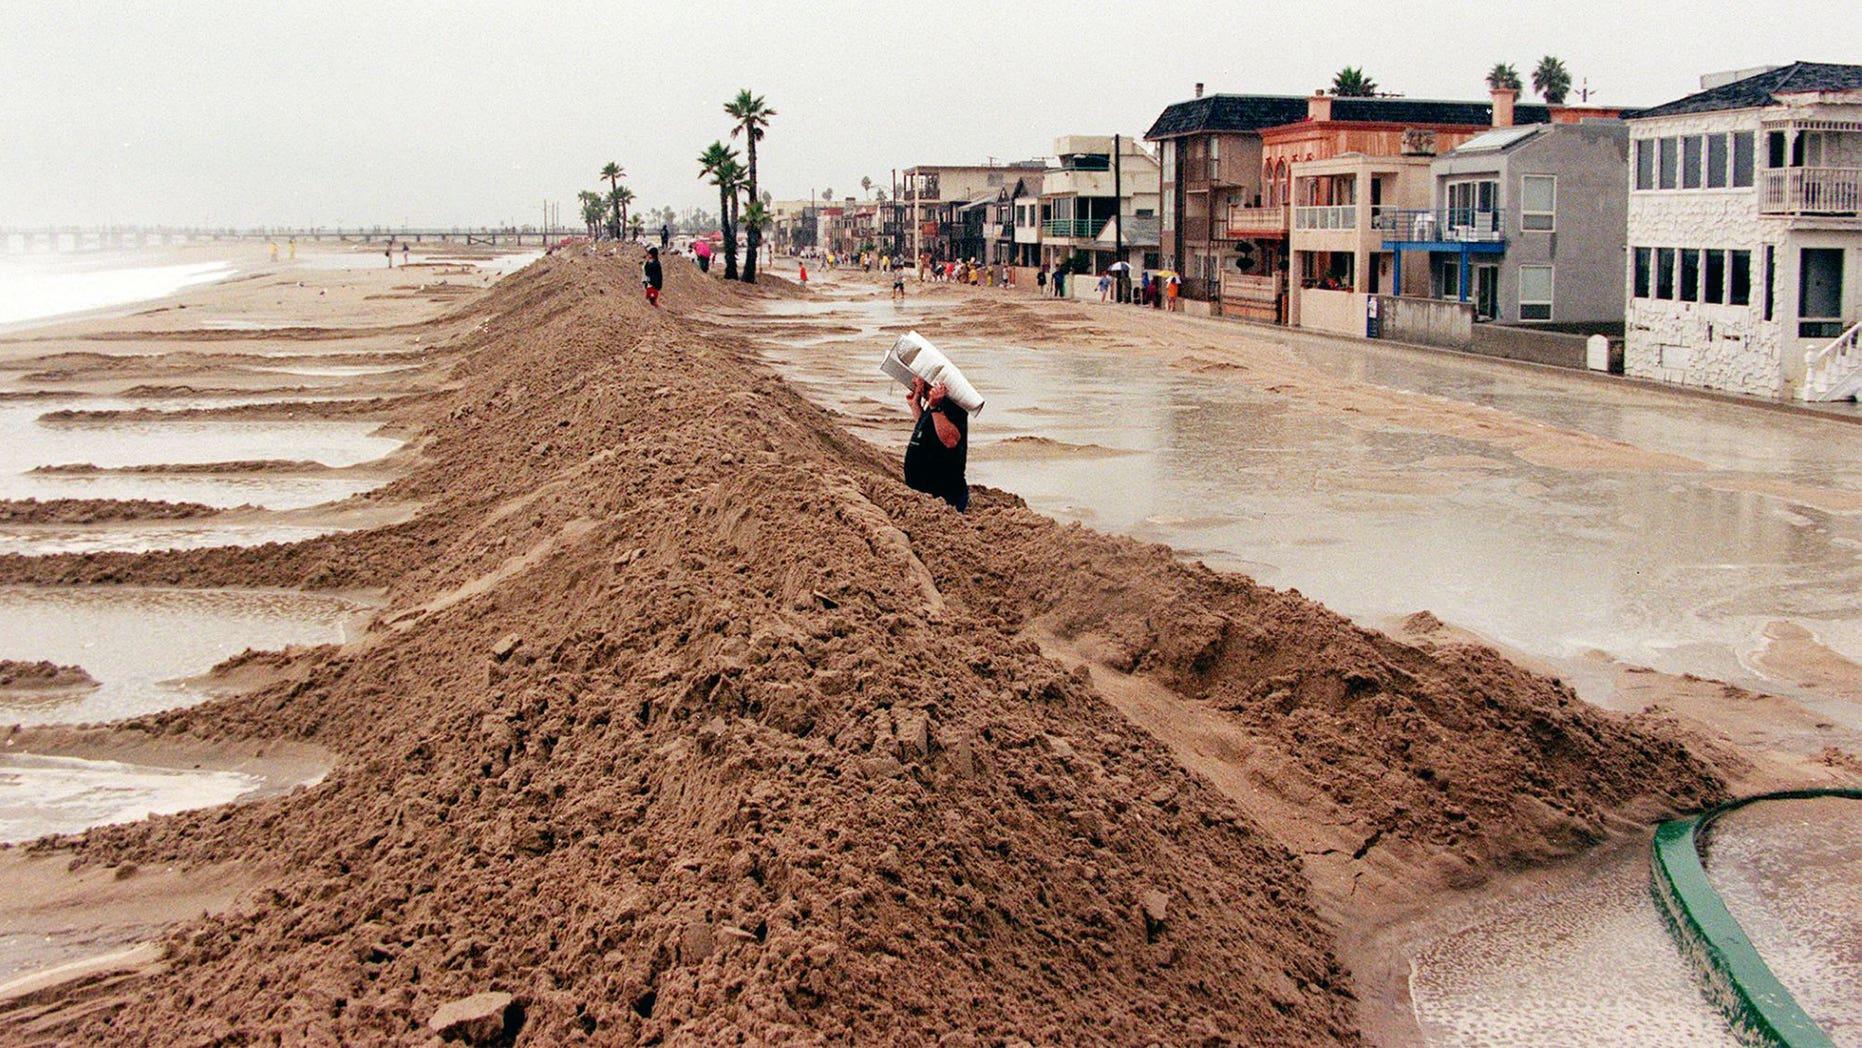 A sand dike protects the Orange County beach